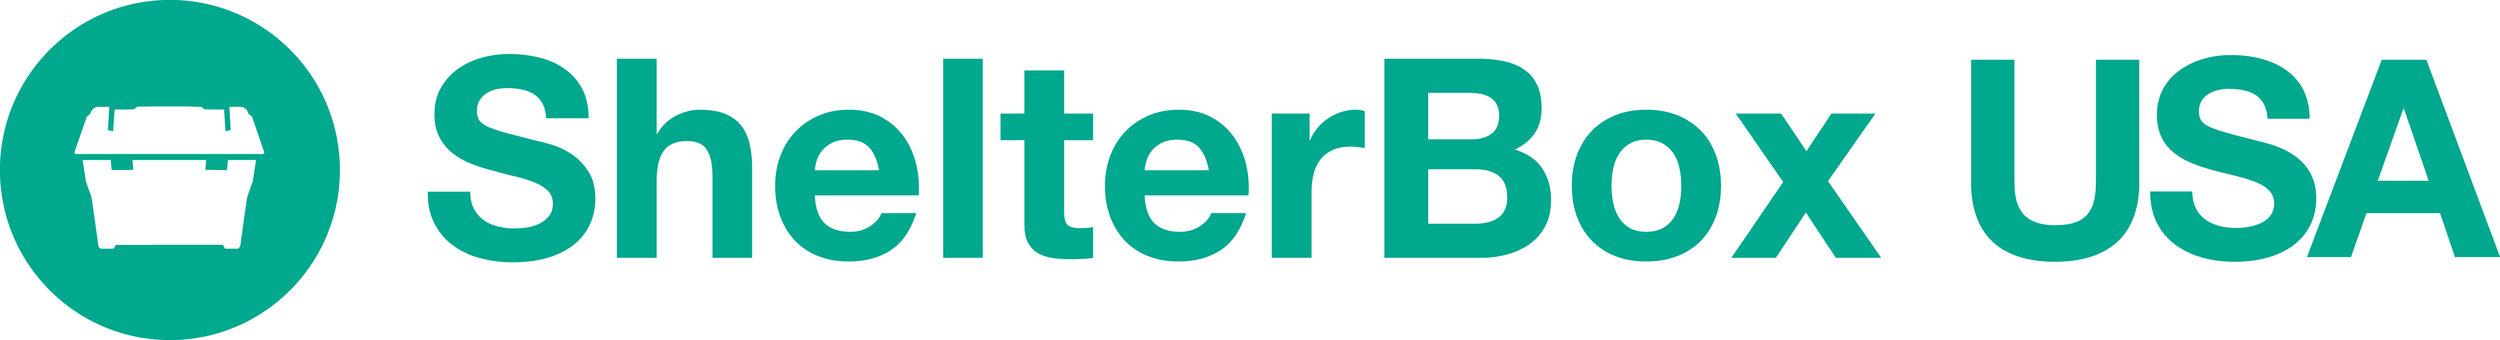 ShelterBox-USA_logo.jpg